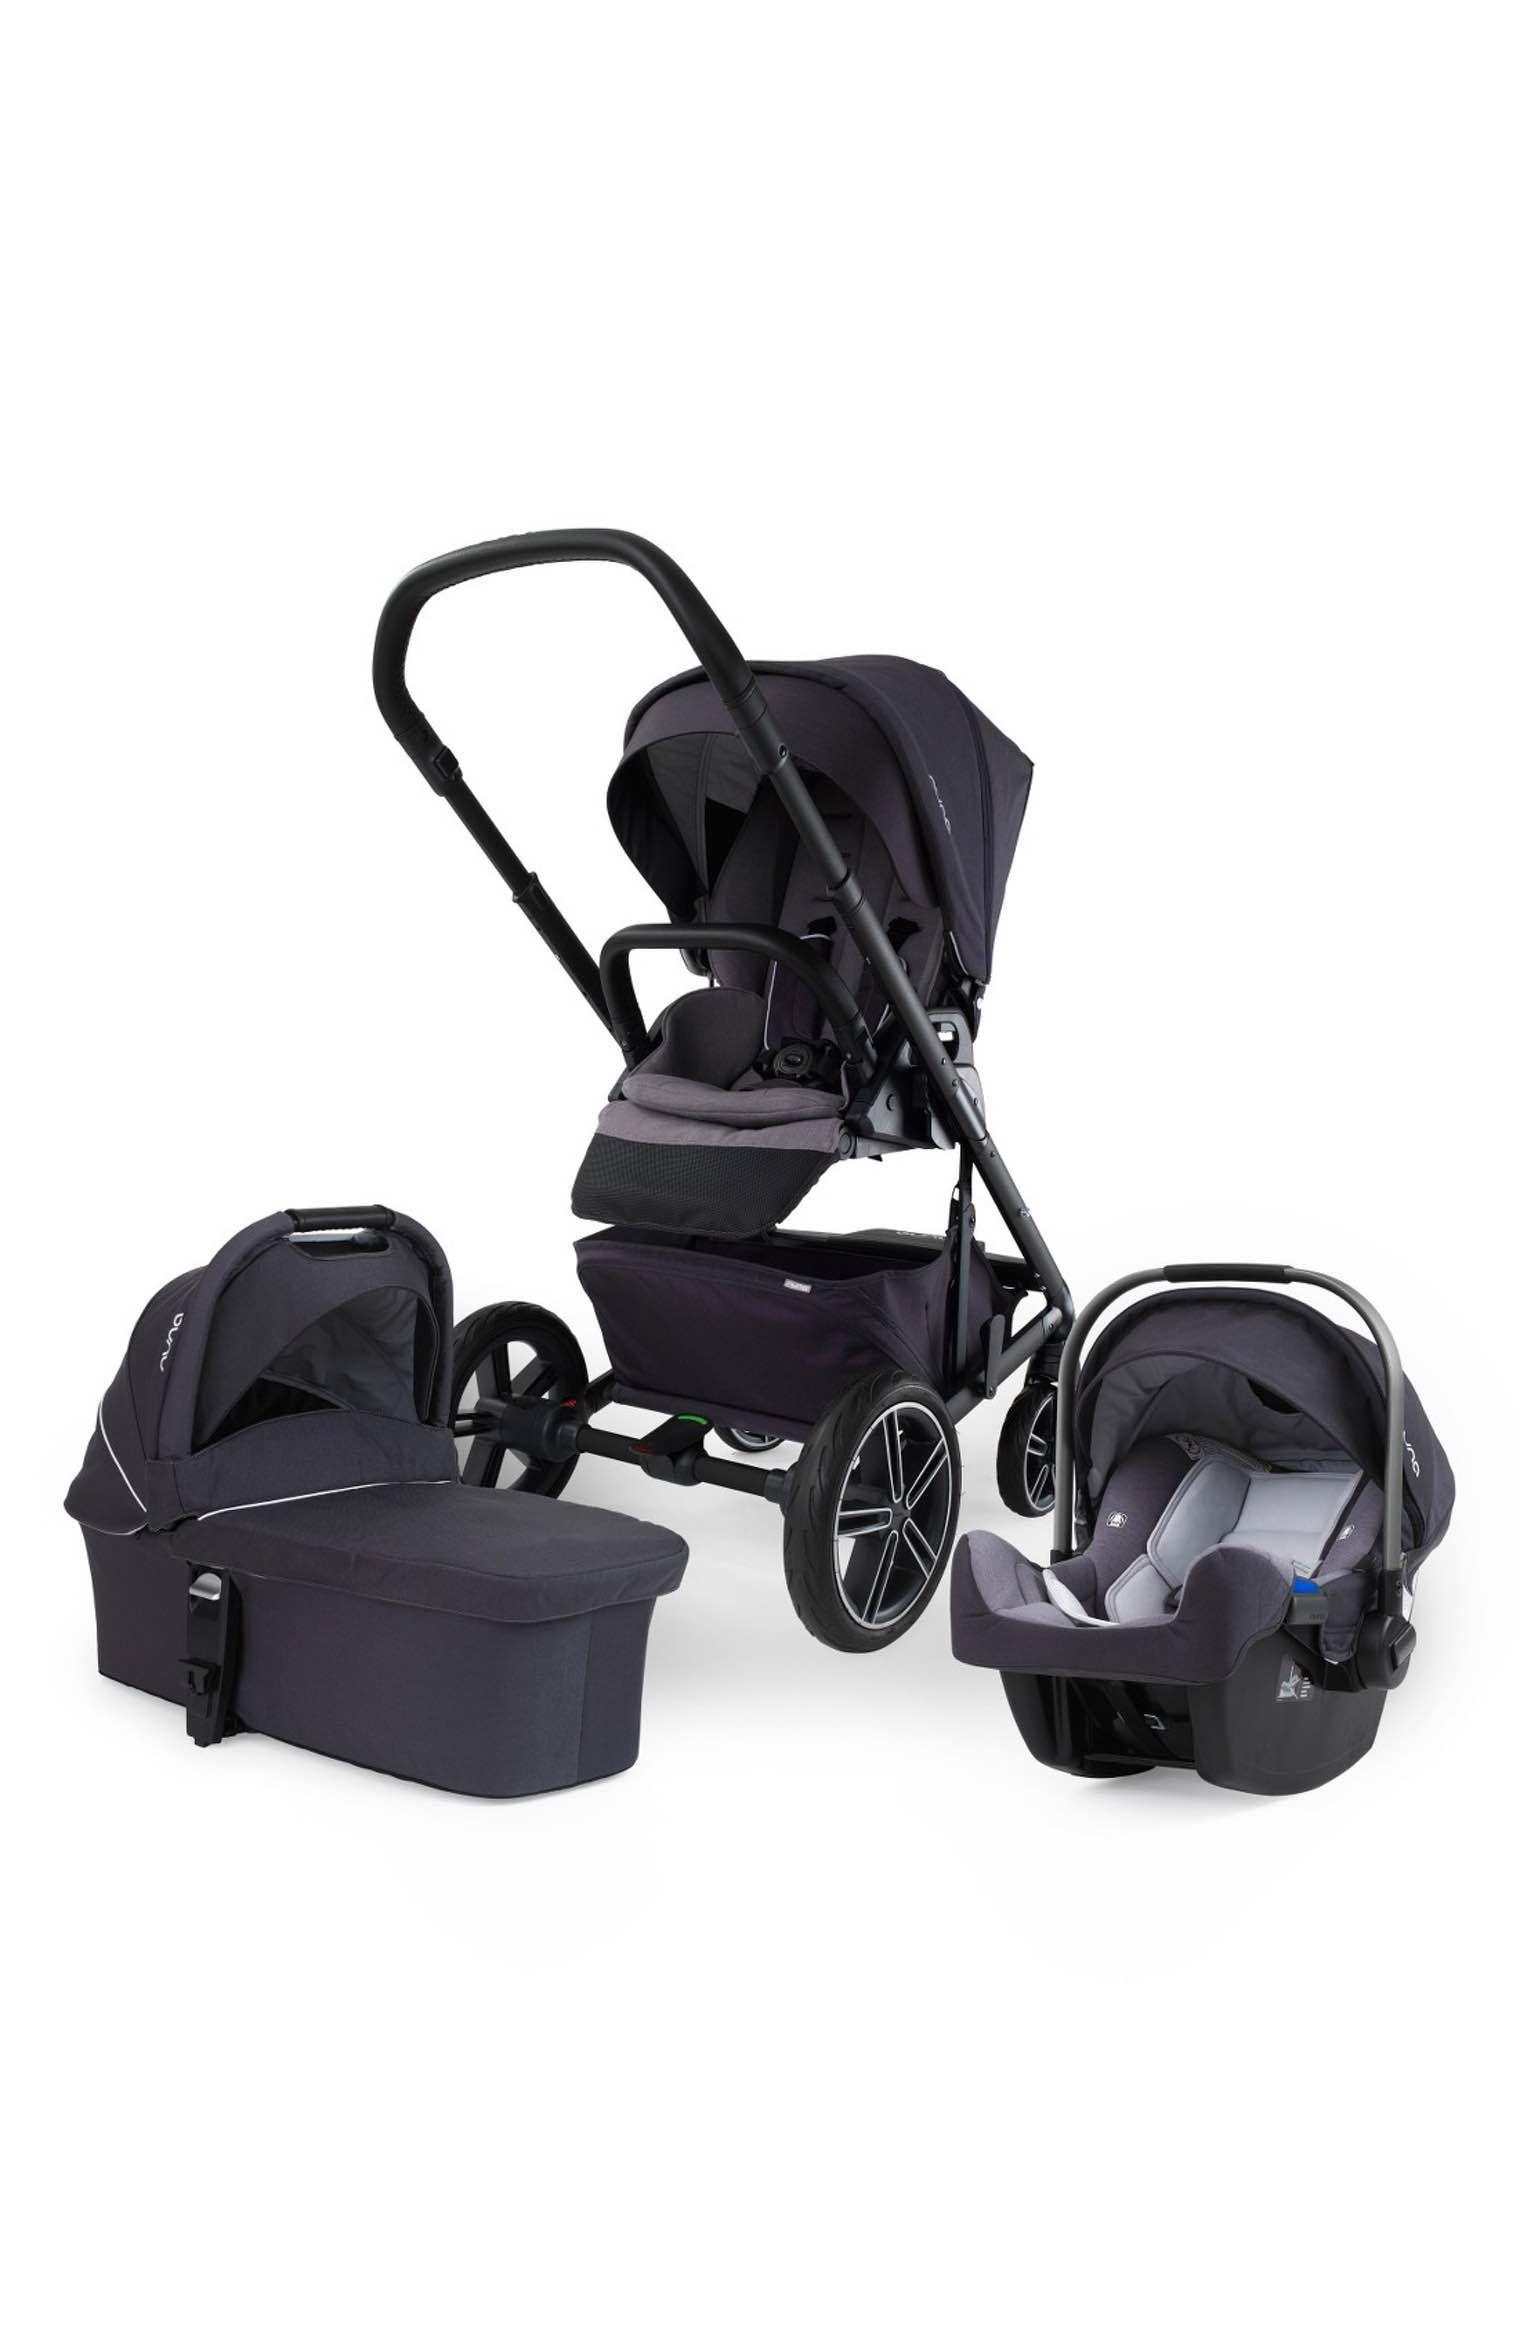 nuna MIXX™ Stroller System & PIPA™ Car Seat Set Nuna